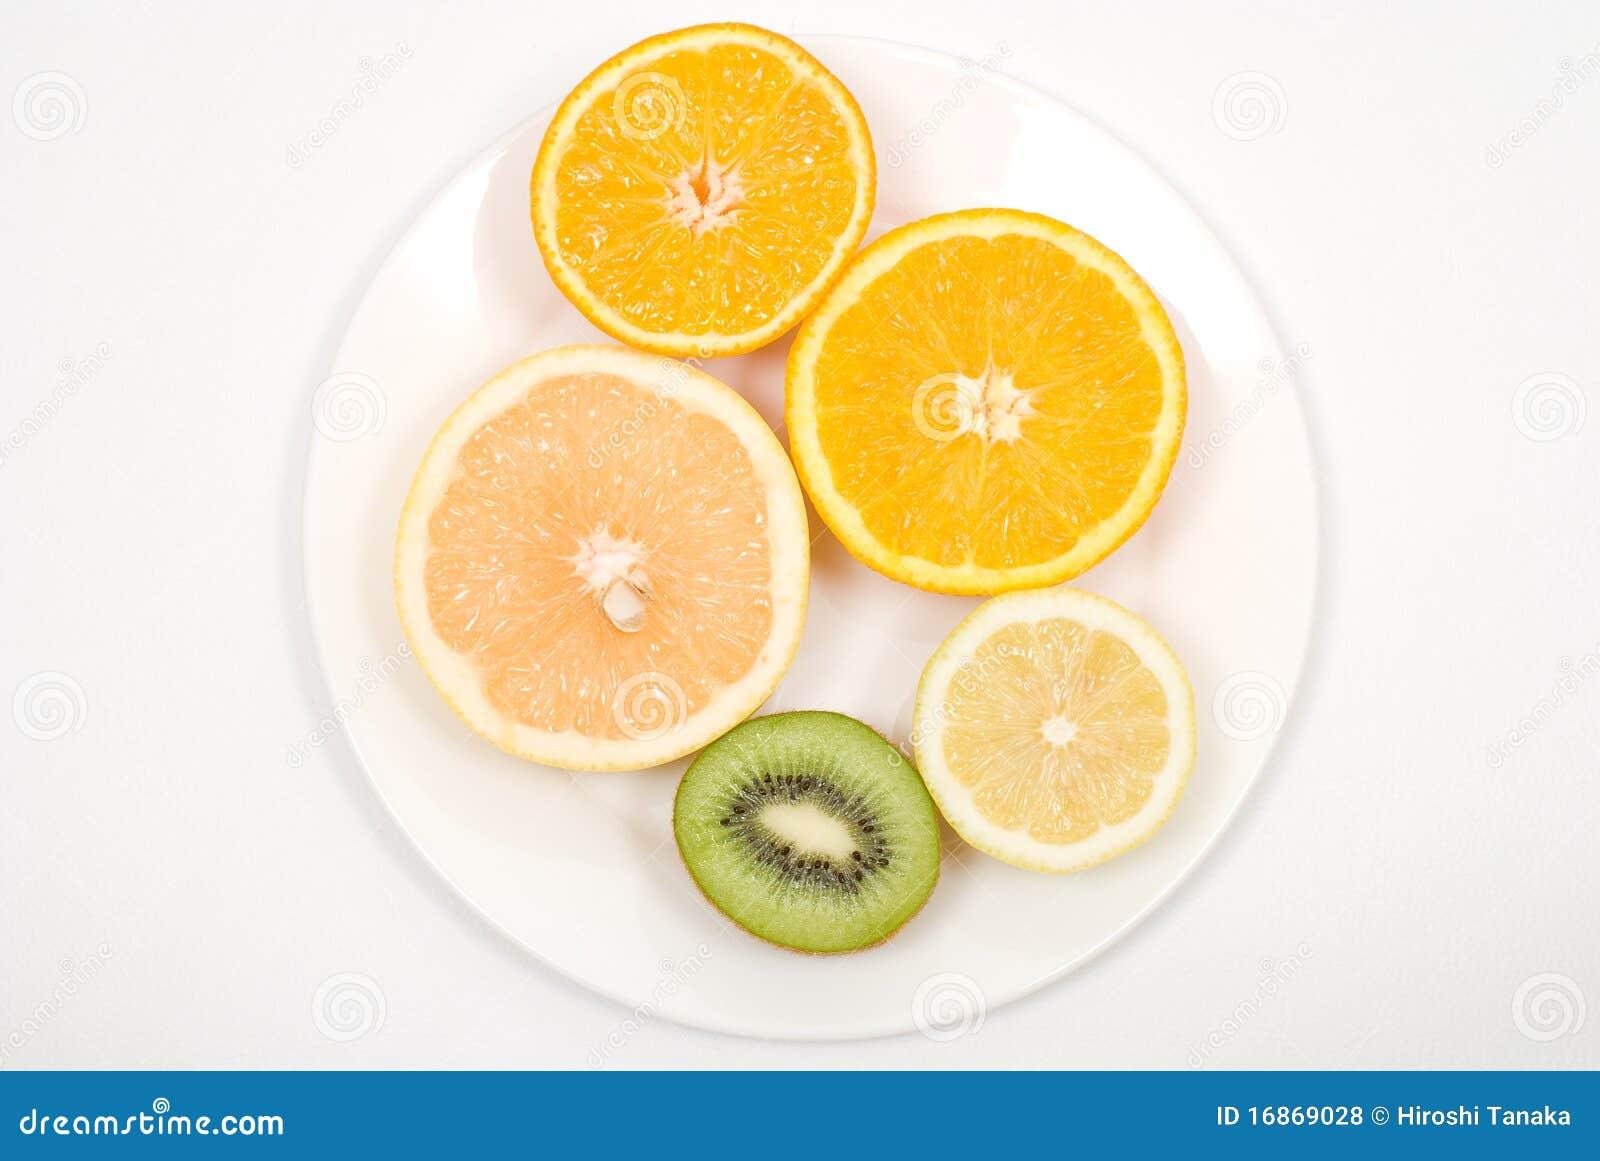 fruit shake feasibility study